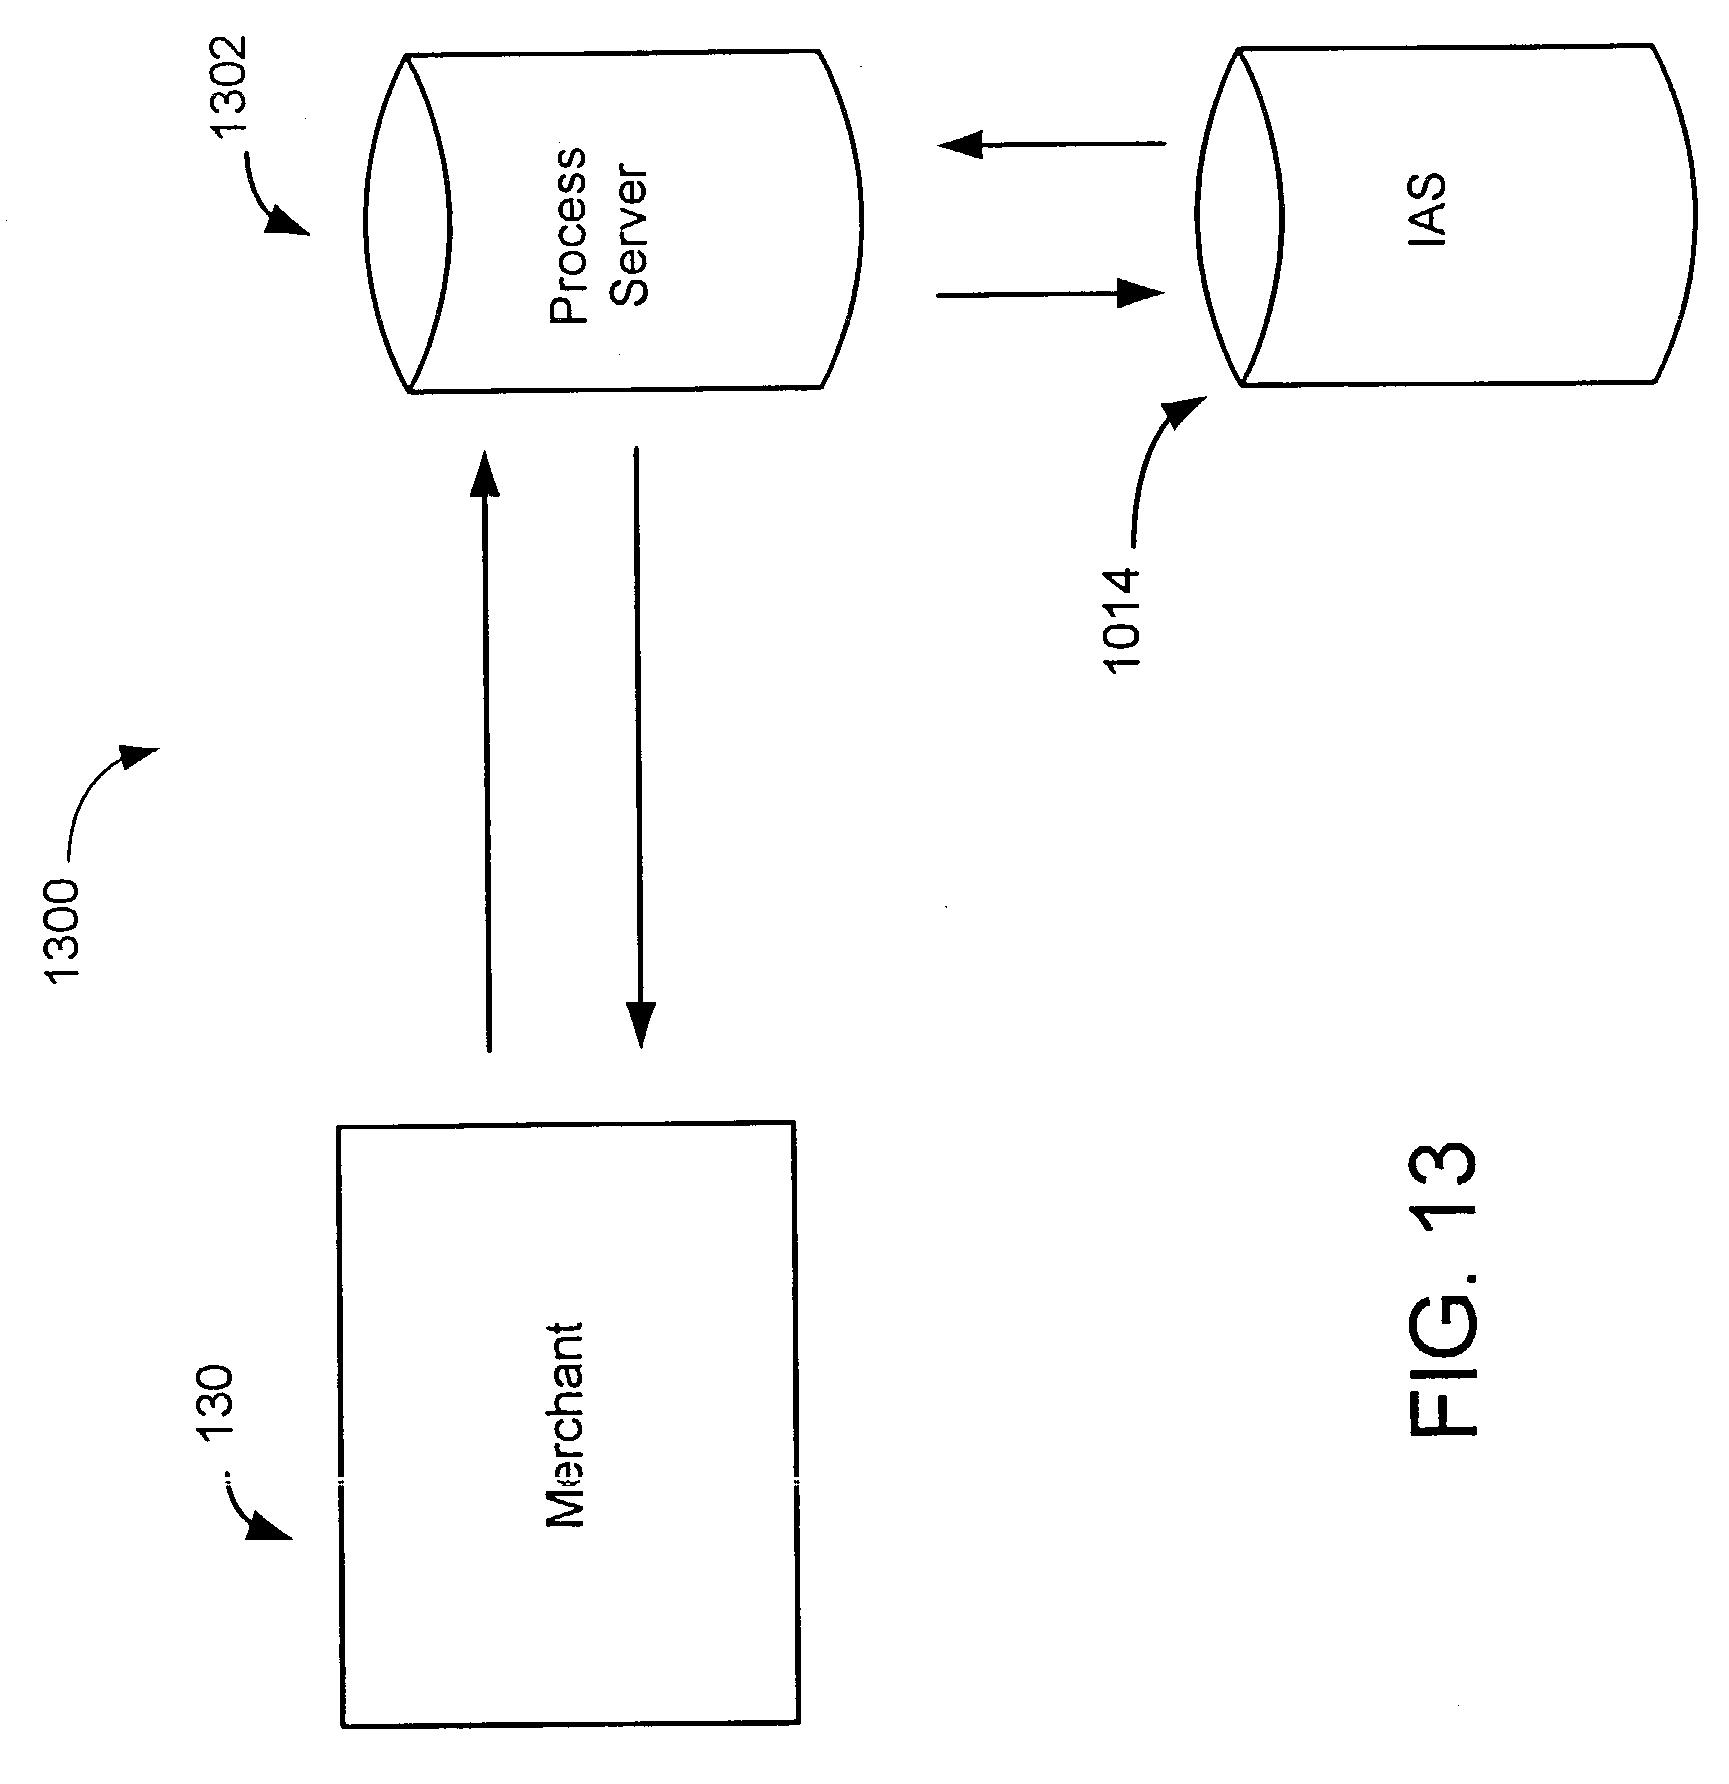 Patent US 7,889,052 B2